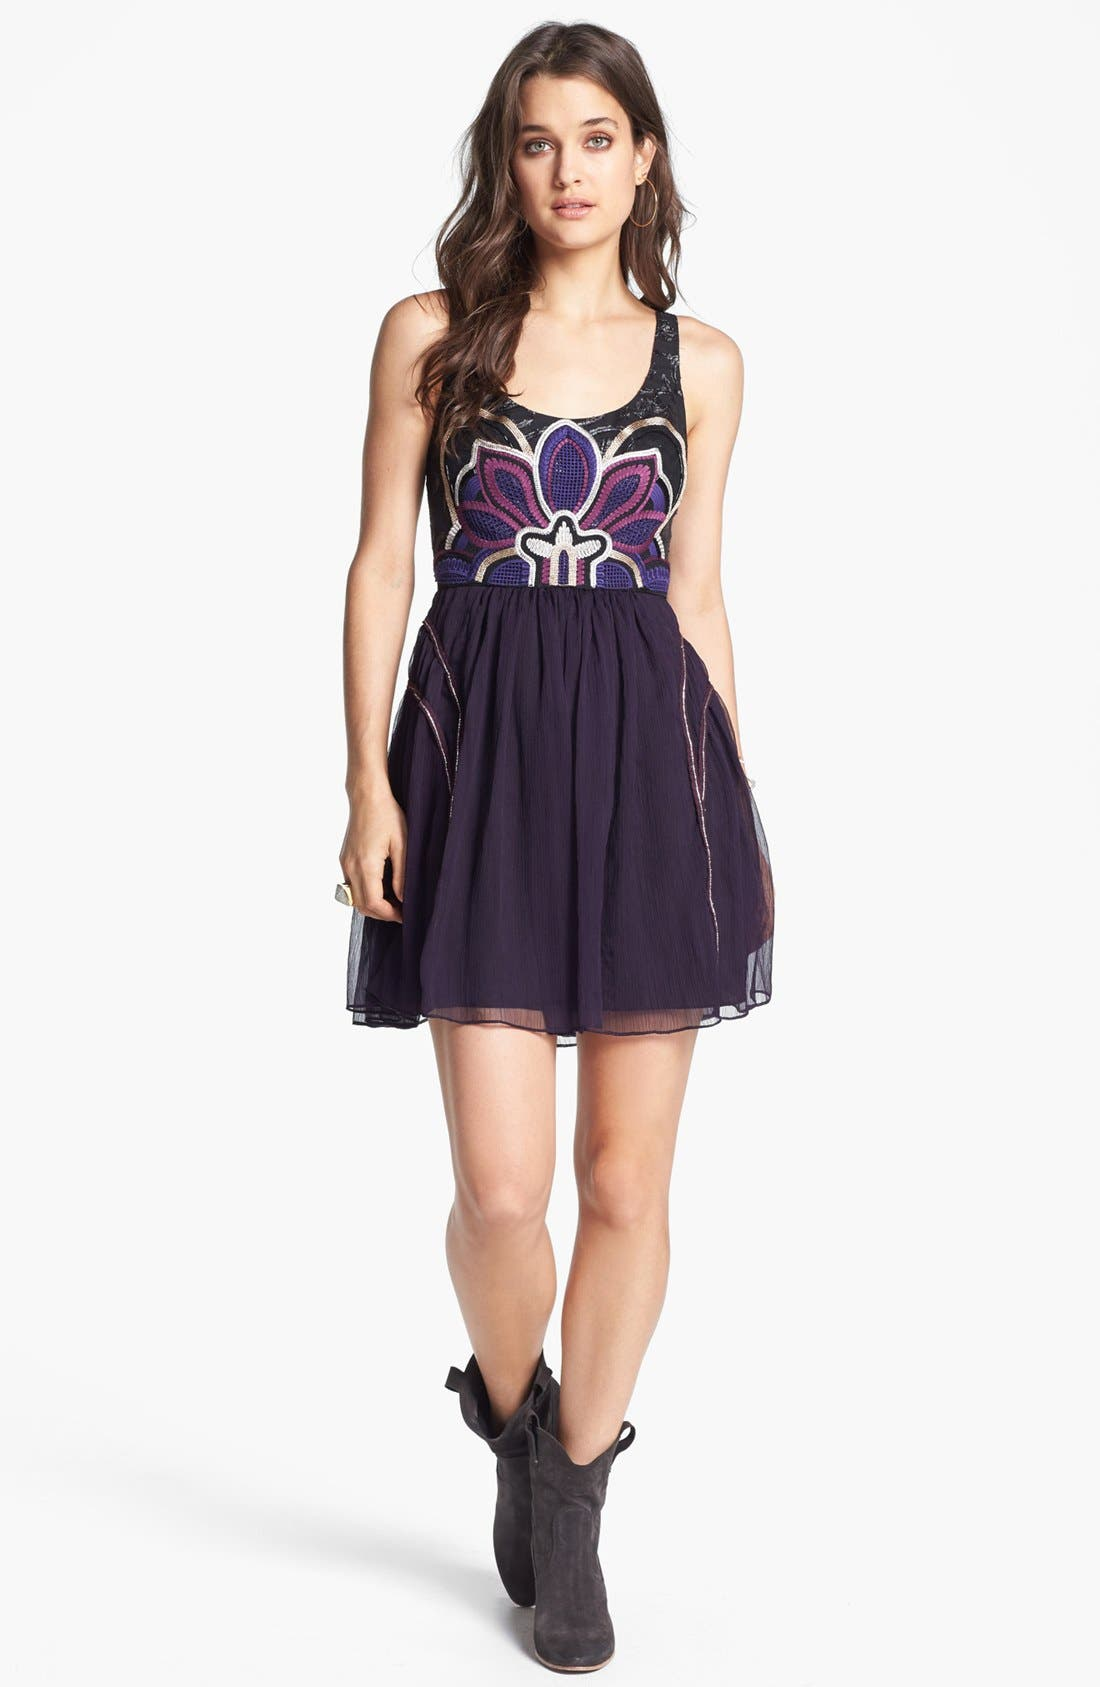 Main Image - Free People 'Lotus Pond' Embellished Fit & Flare Dress